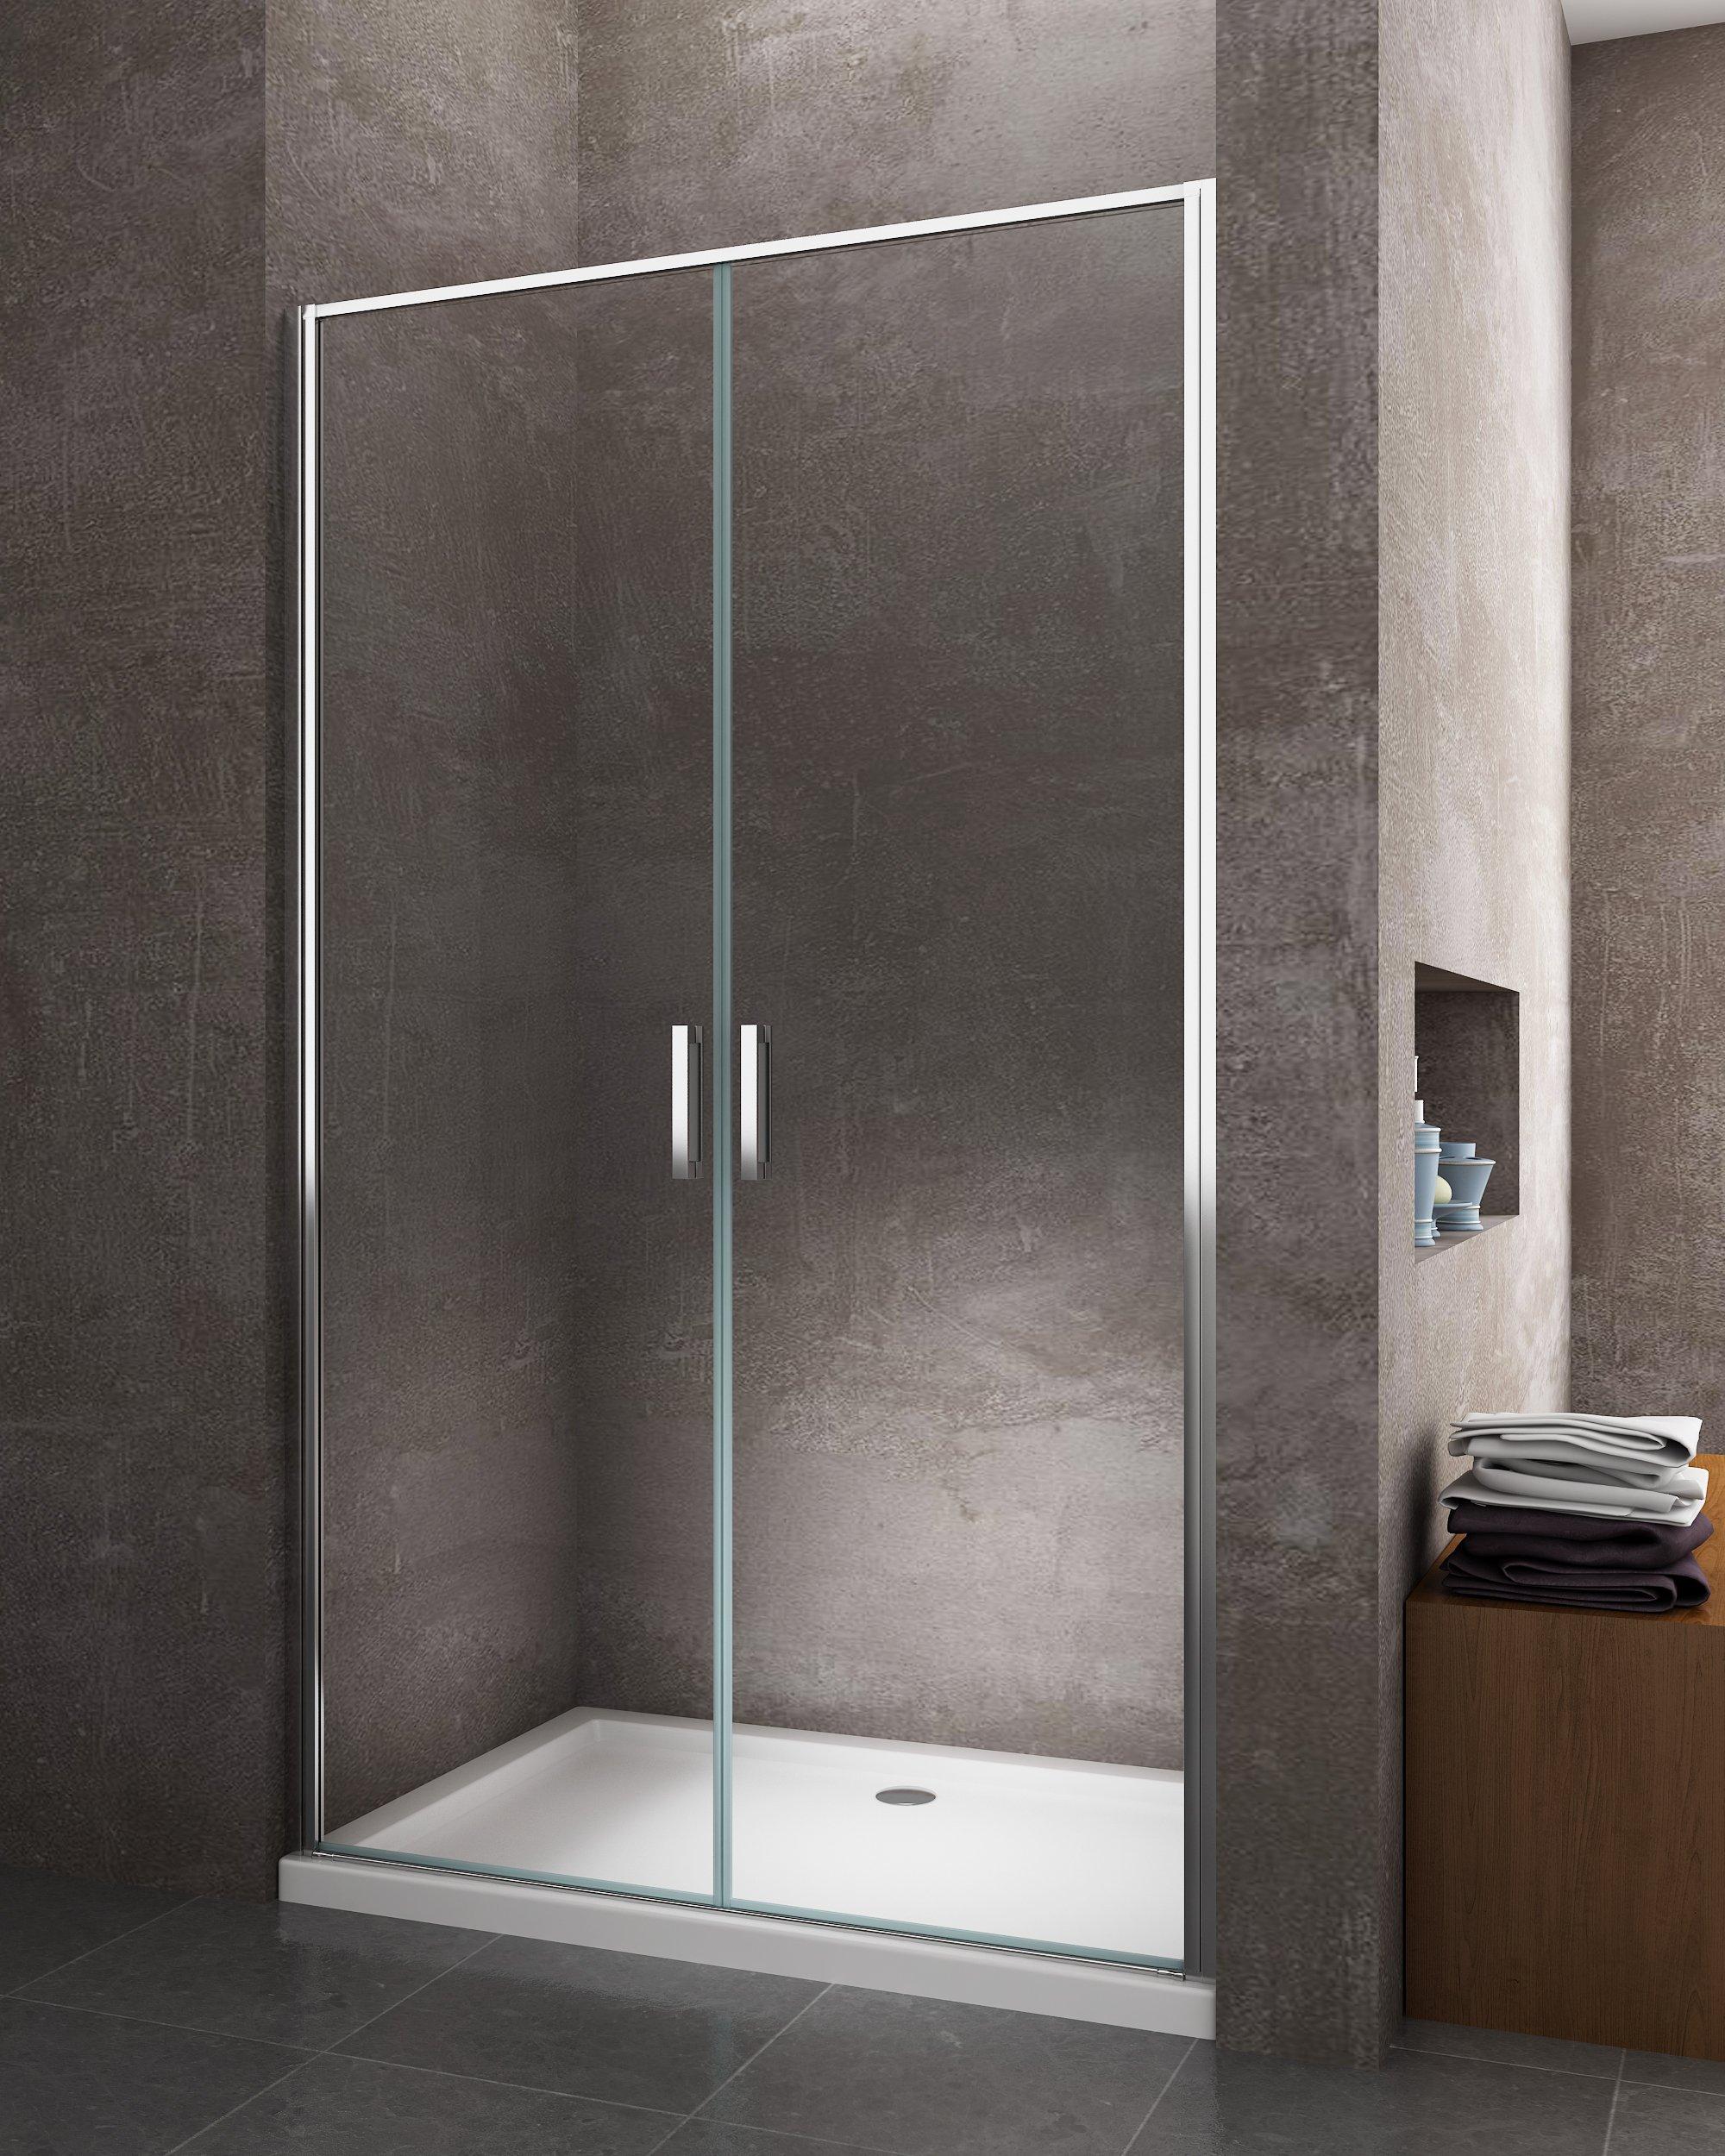 Docce moderne prezzi box doccia lati a scomparsa in - Leroy merlin bagno box doccia ...